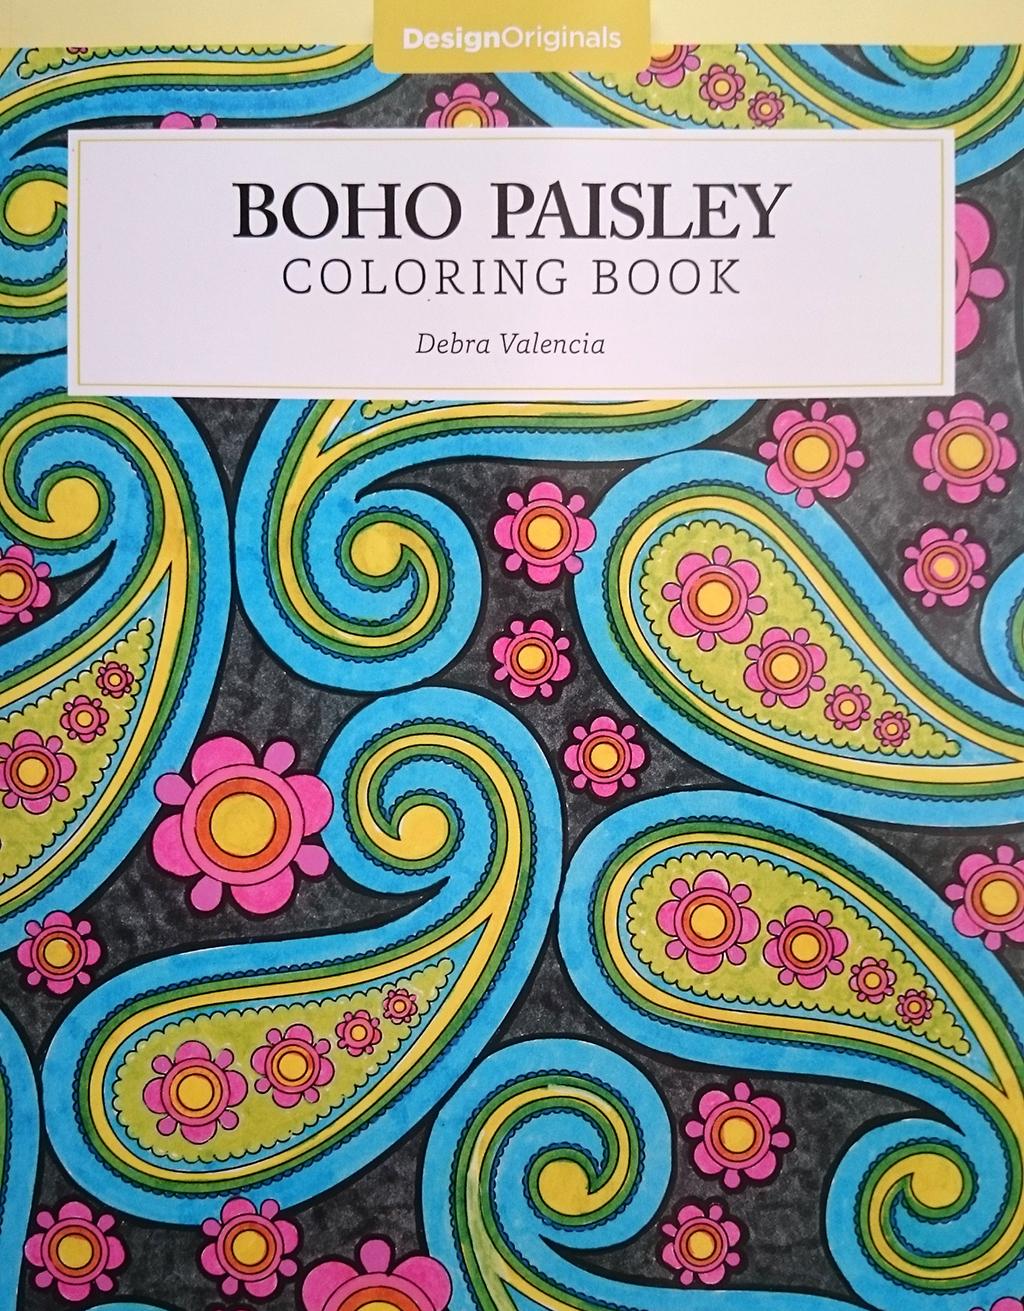 Boho-Paisley-Coloring-Book-01